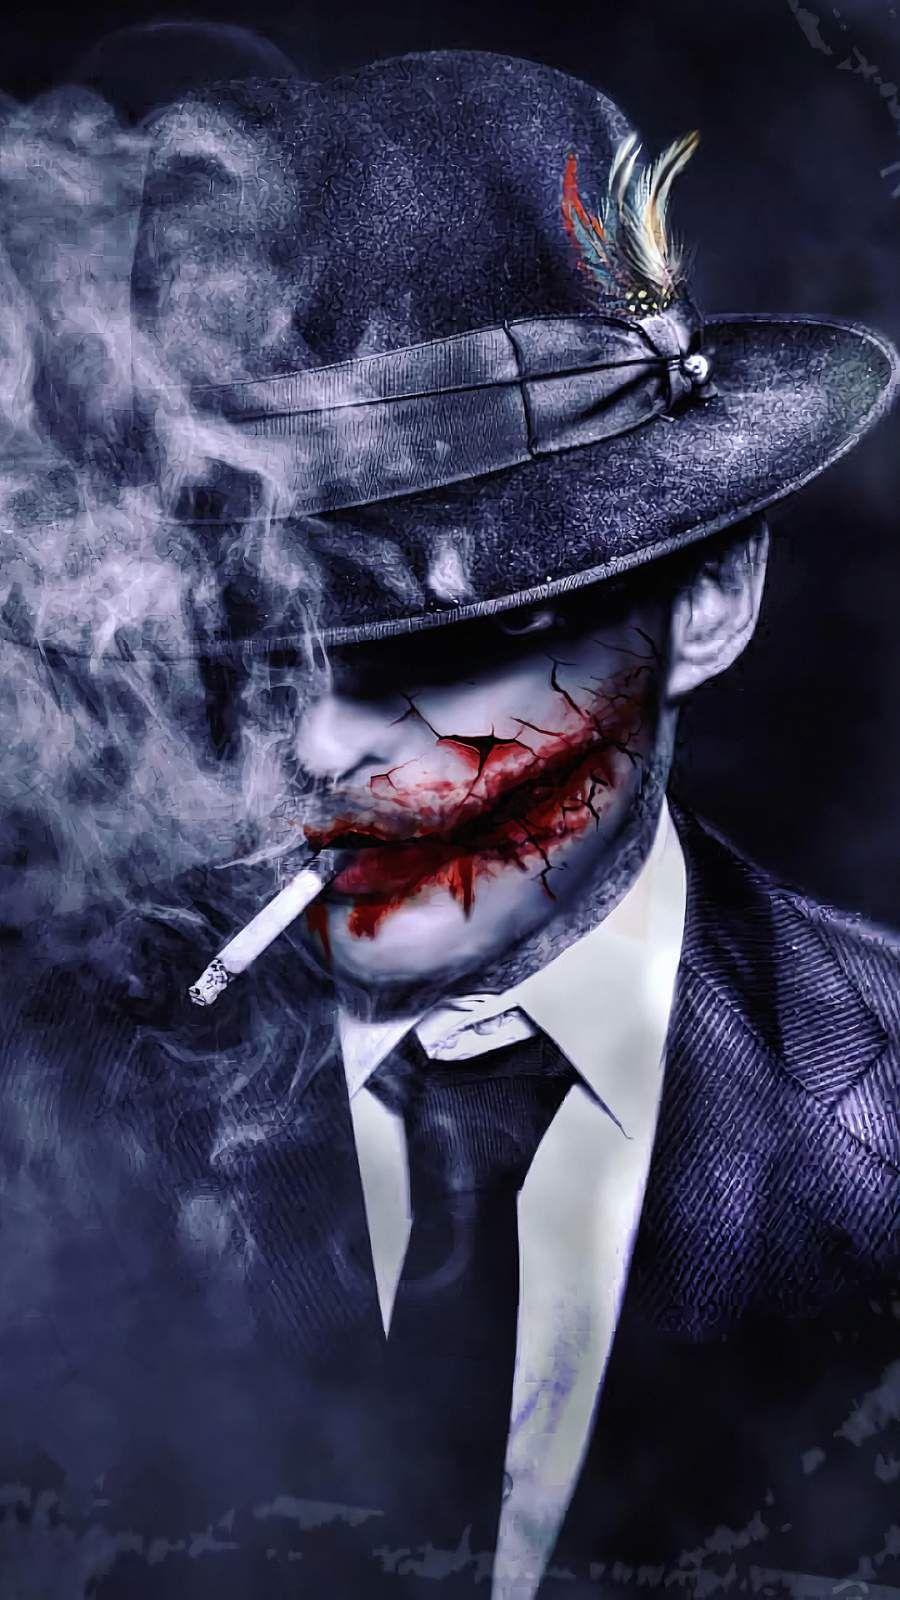 Joker Hat Iphone Wallpaper Joker Iphone Wallpaper Joker